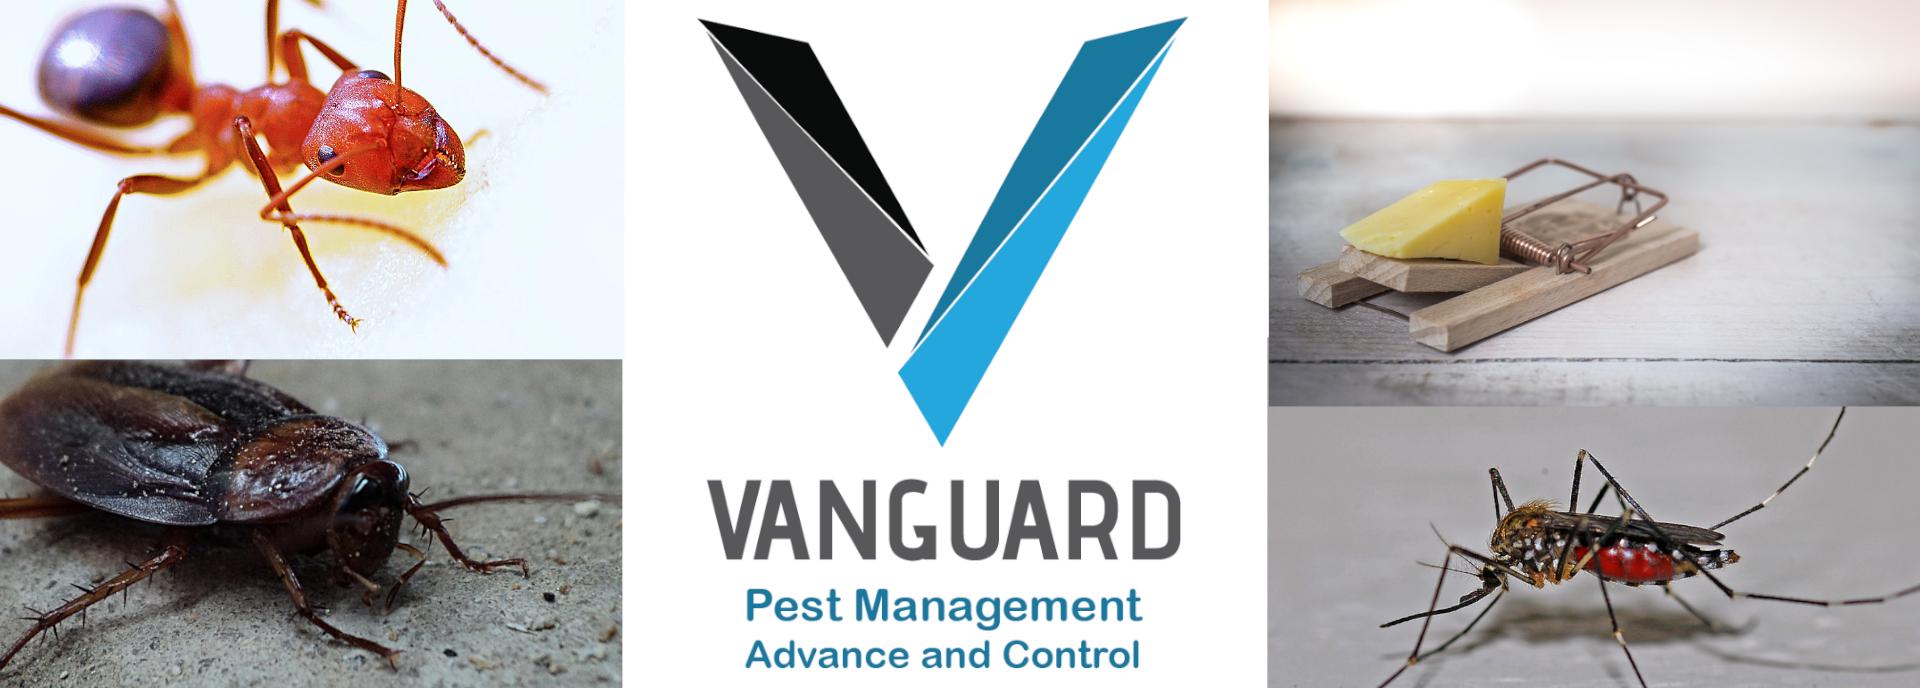 Vanguard Pest Management Header